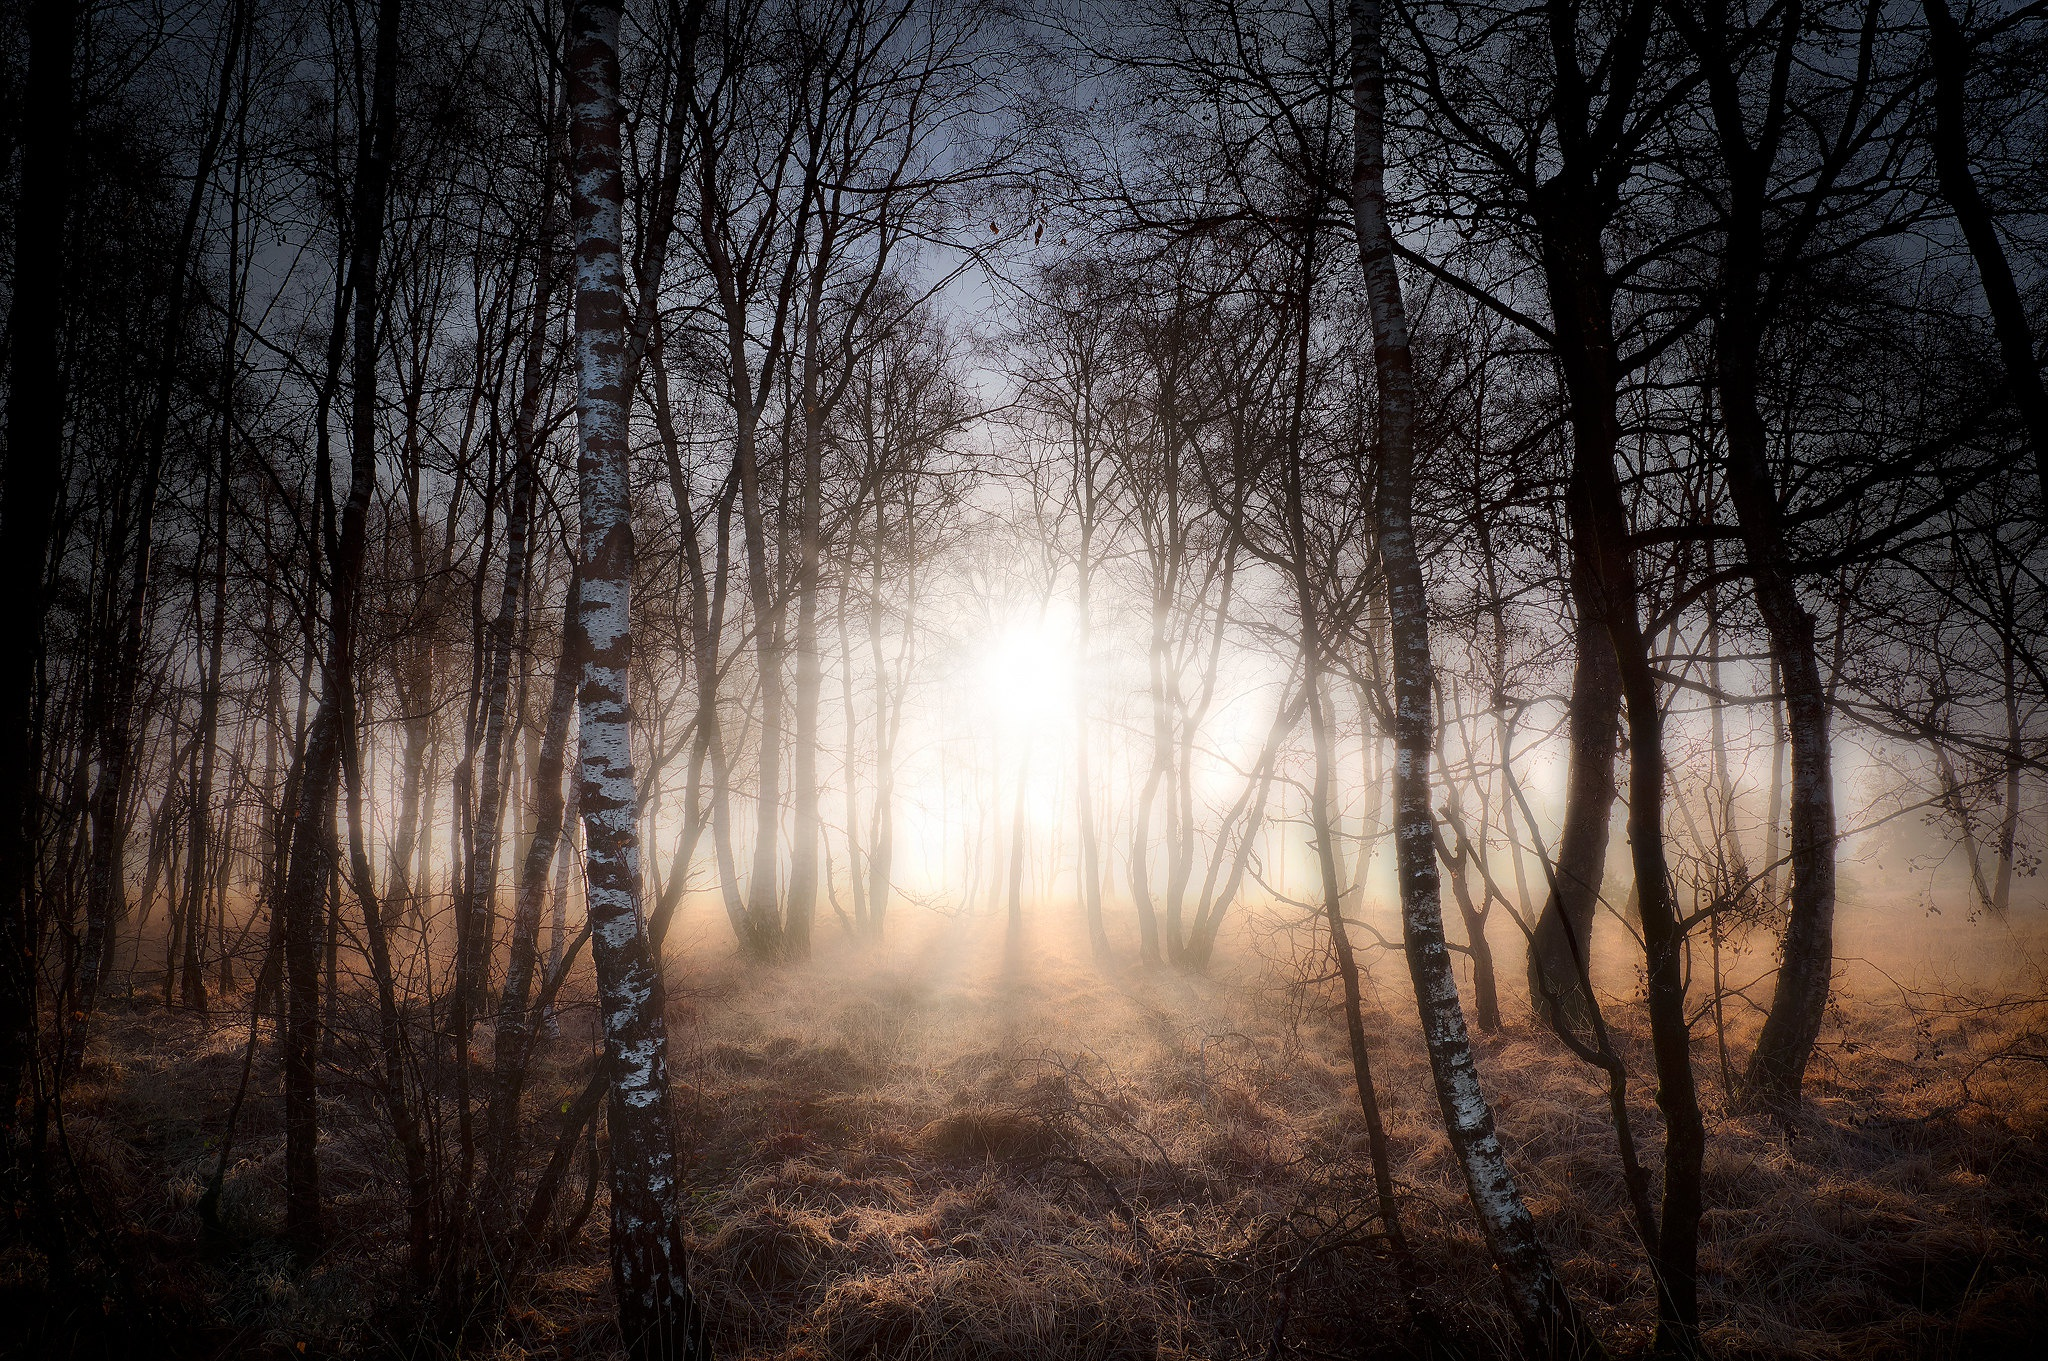 Forest Nature Sunbeam Tree 2048x1361